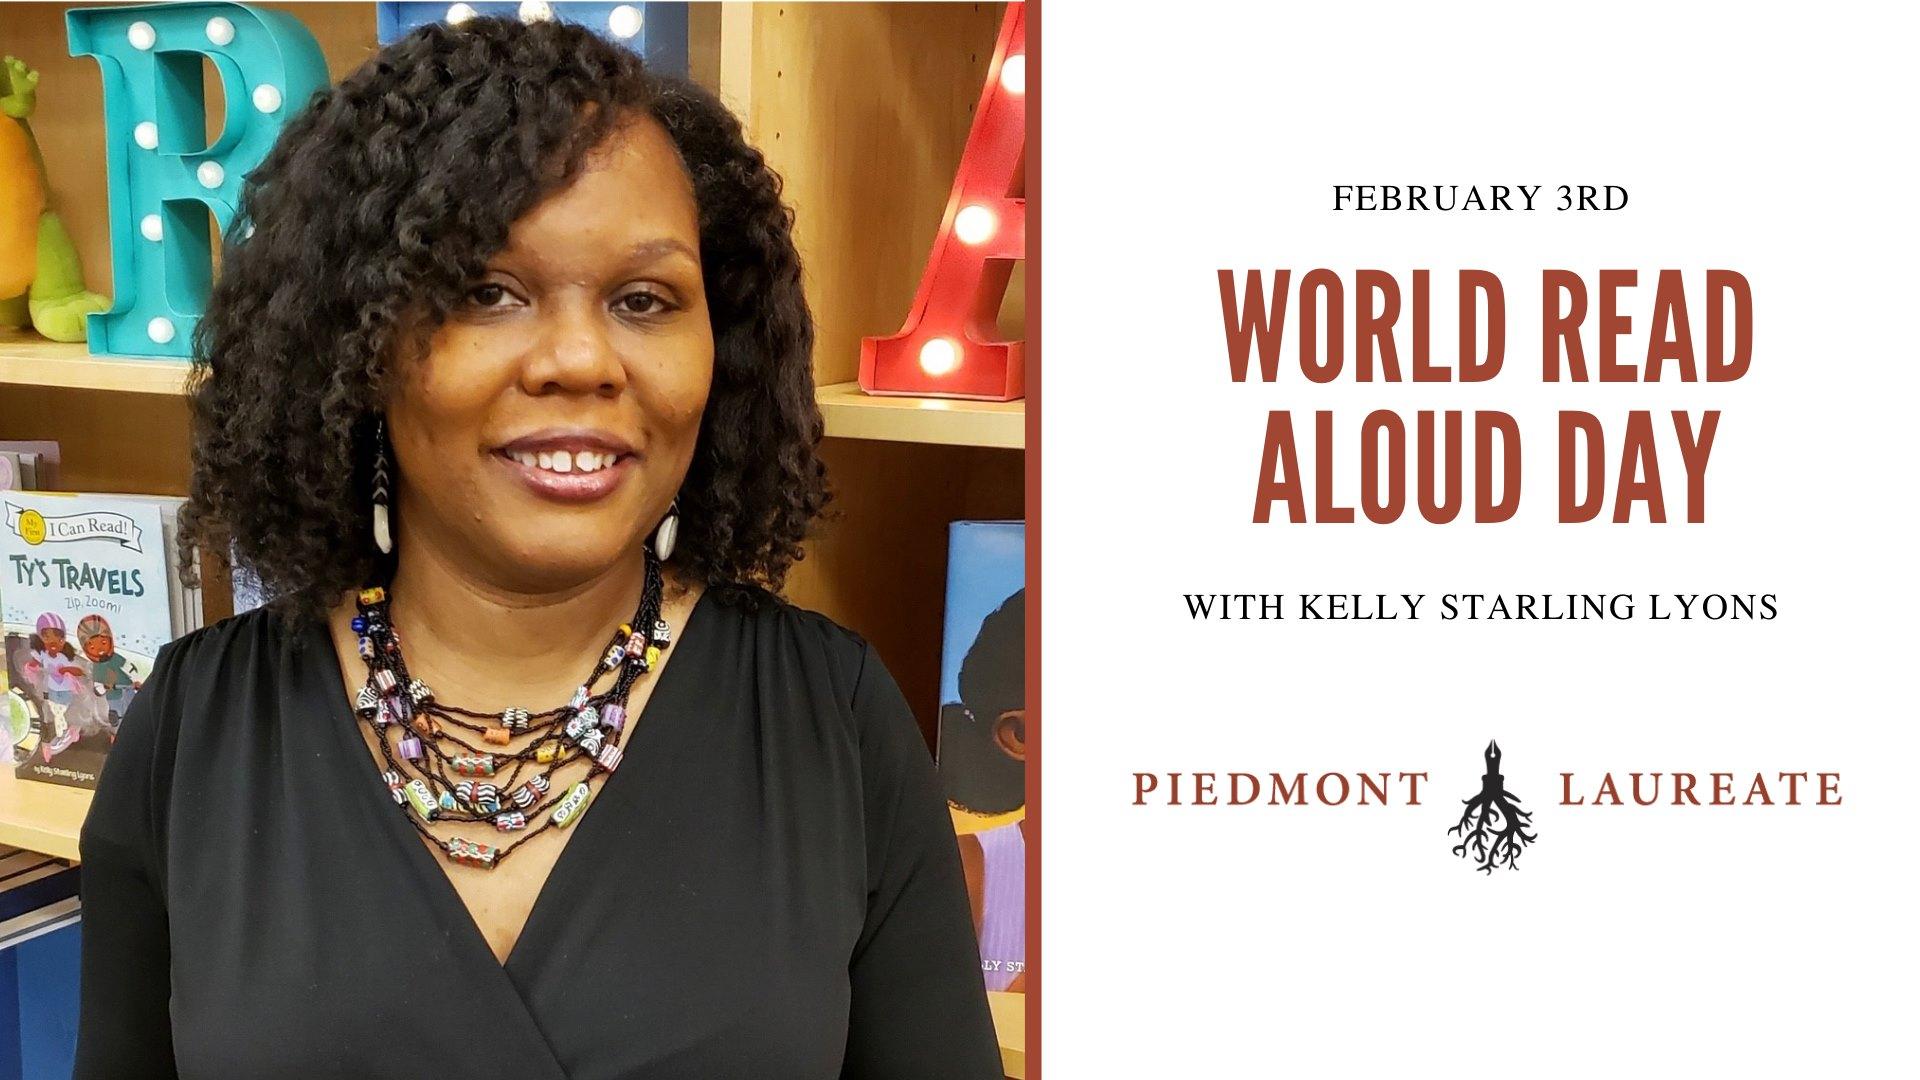 World Read Aloud Day